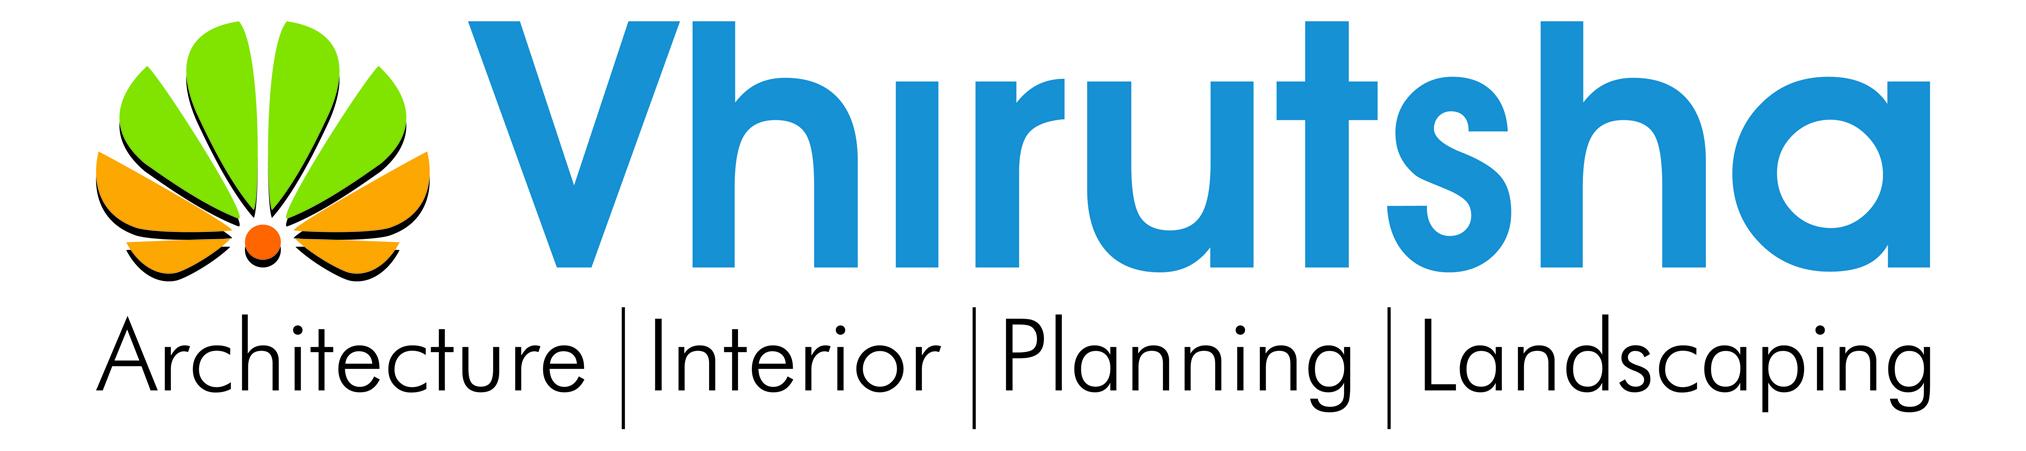 Vhirutsha - logo